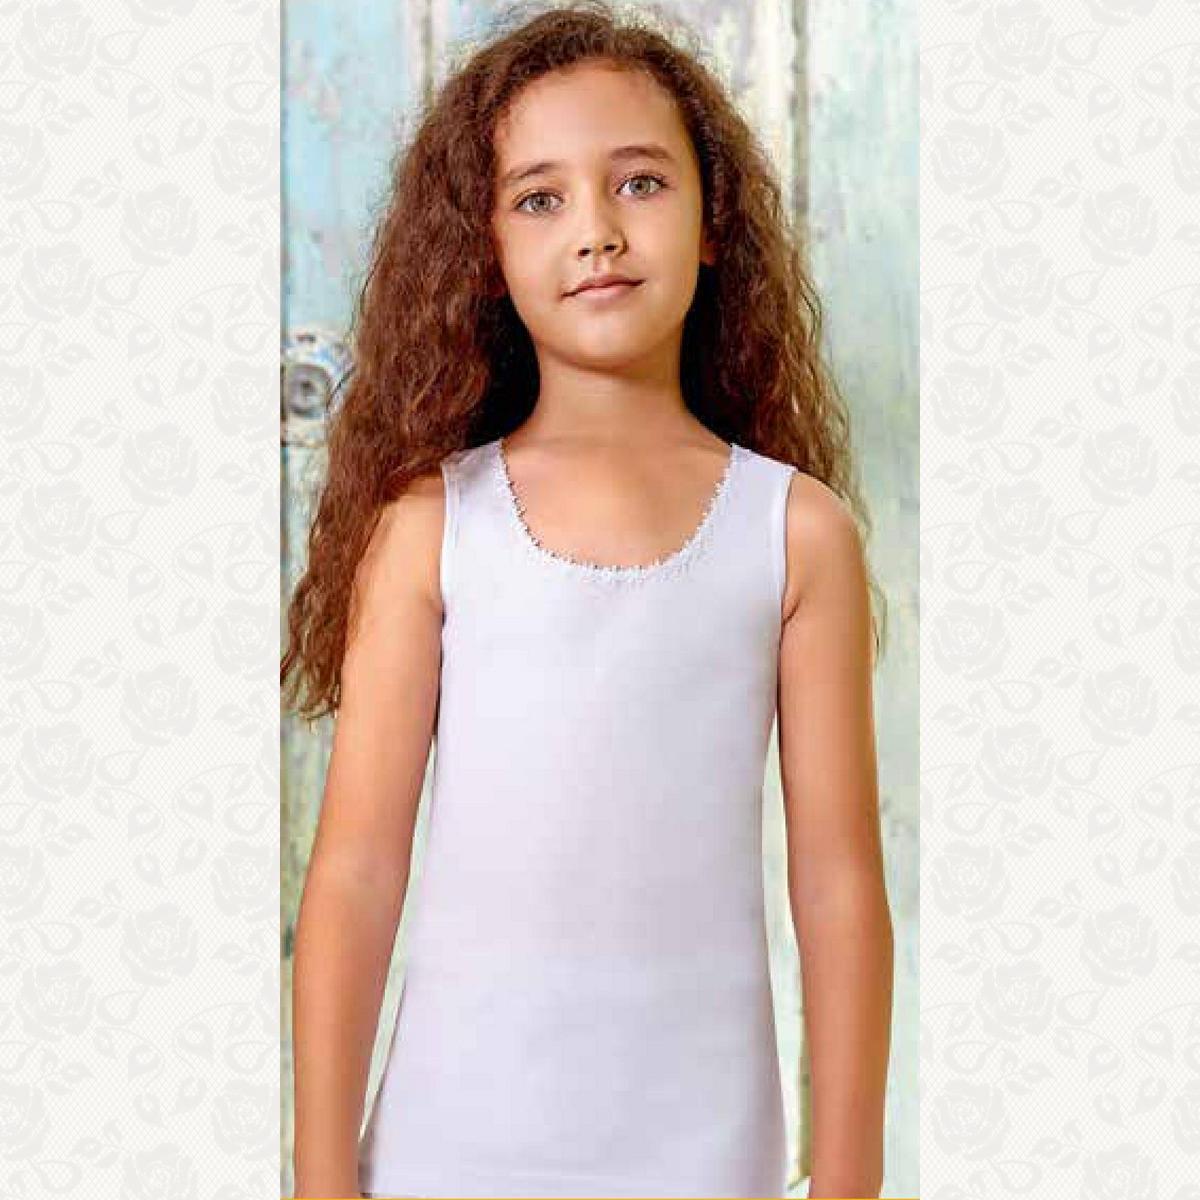 Майка для девочки размер от 1-3, цвет белый с фото, 6 шт.